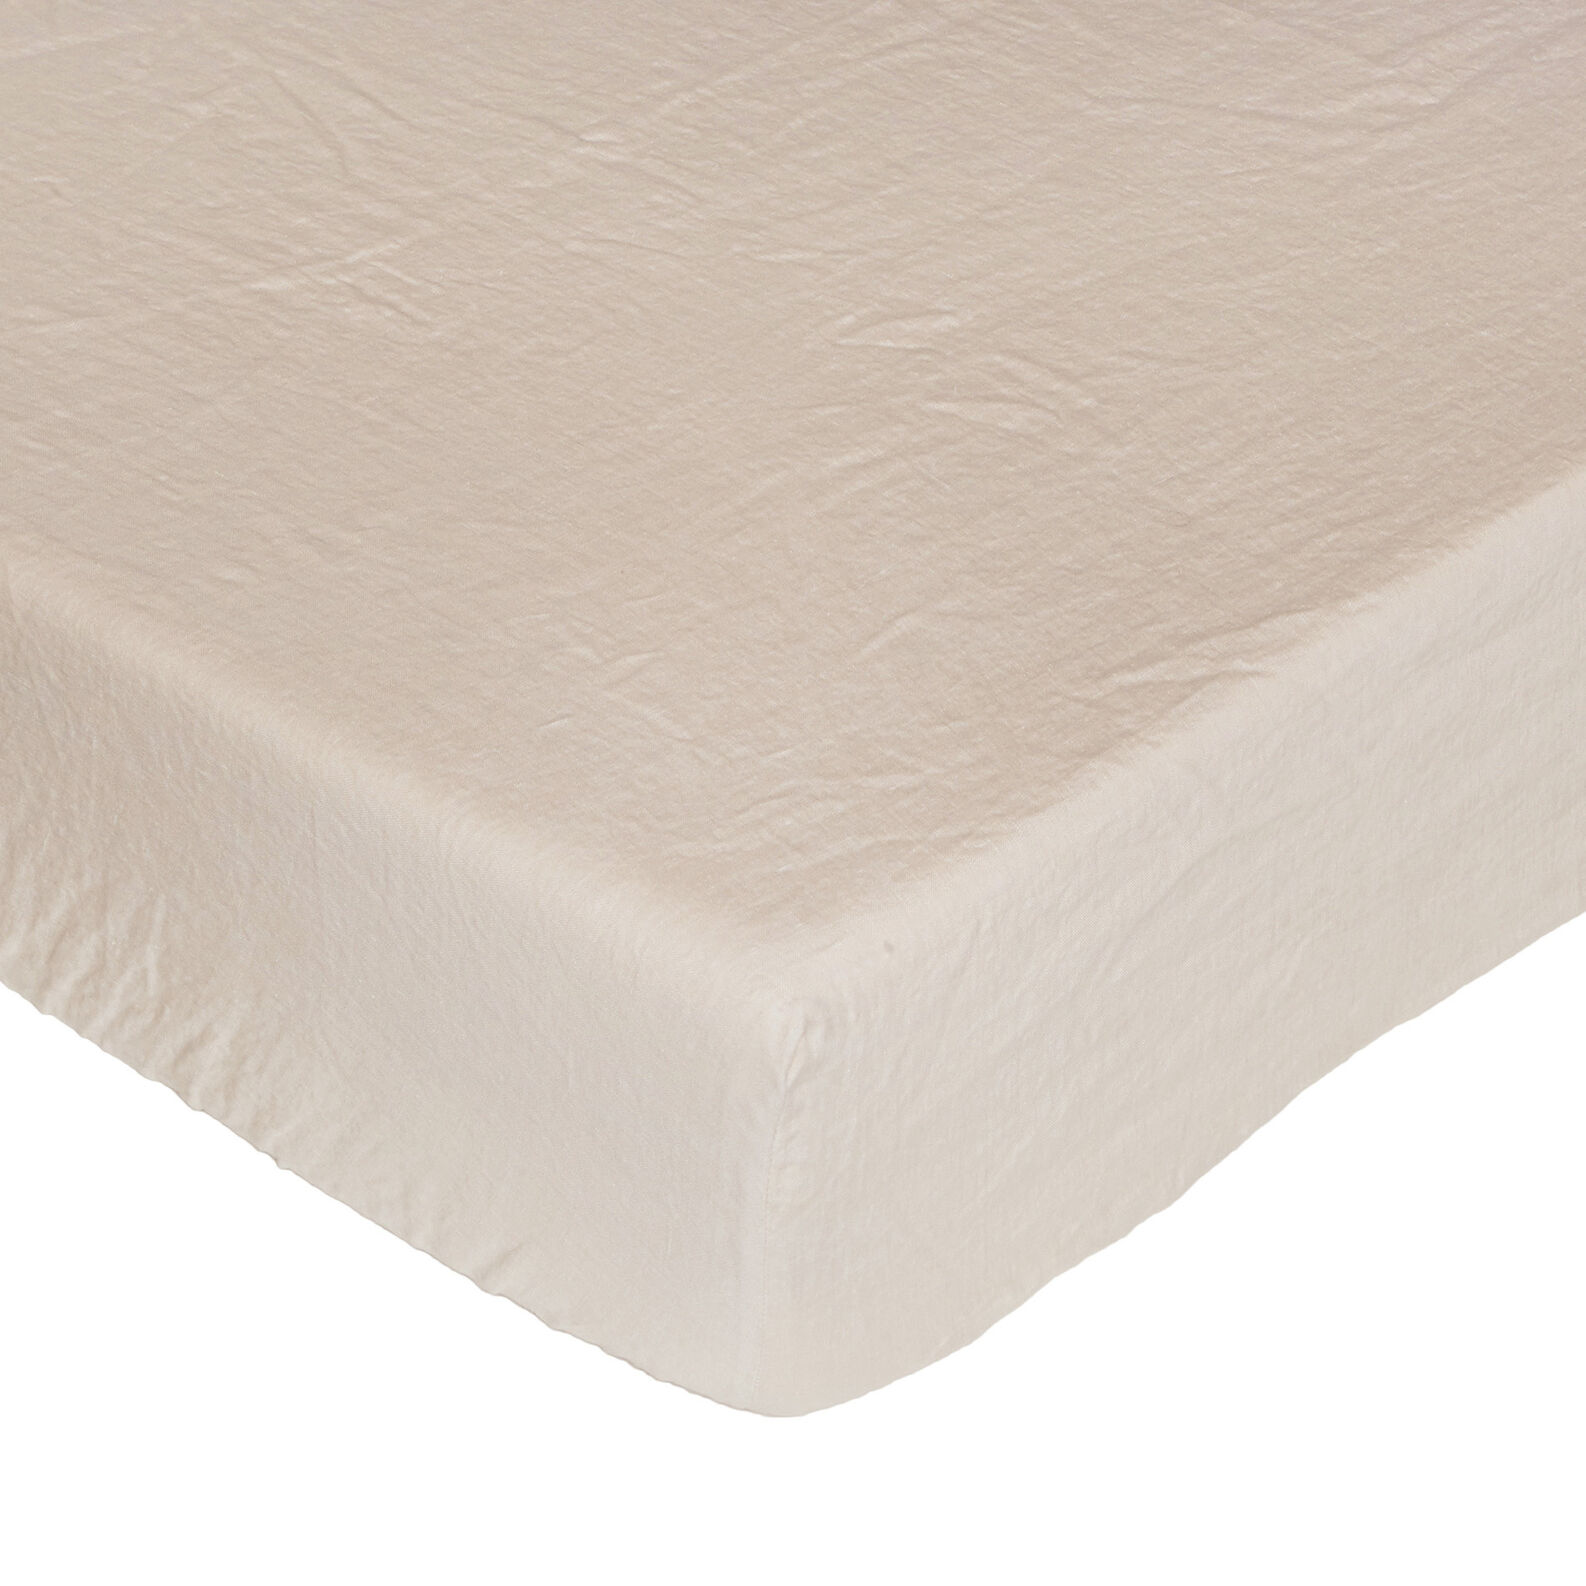 Plain fitted sheet in 145 g linen